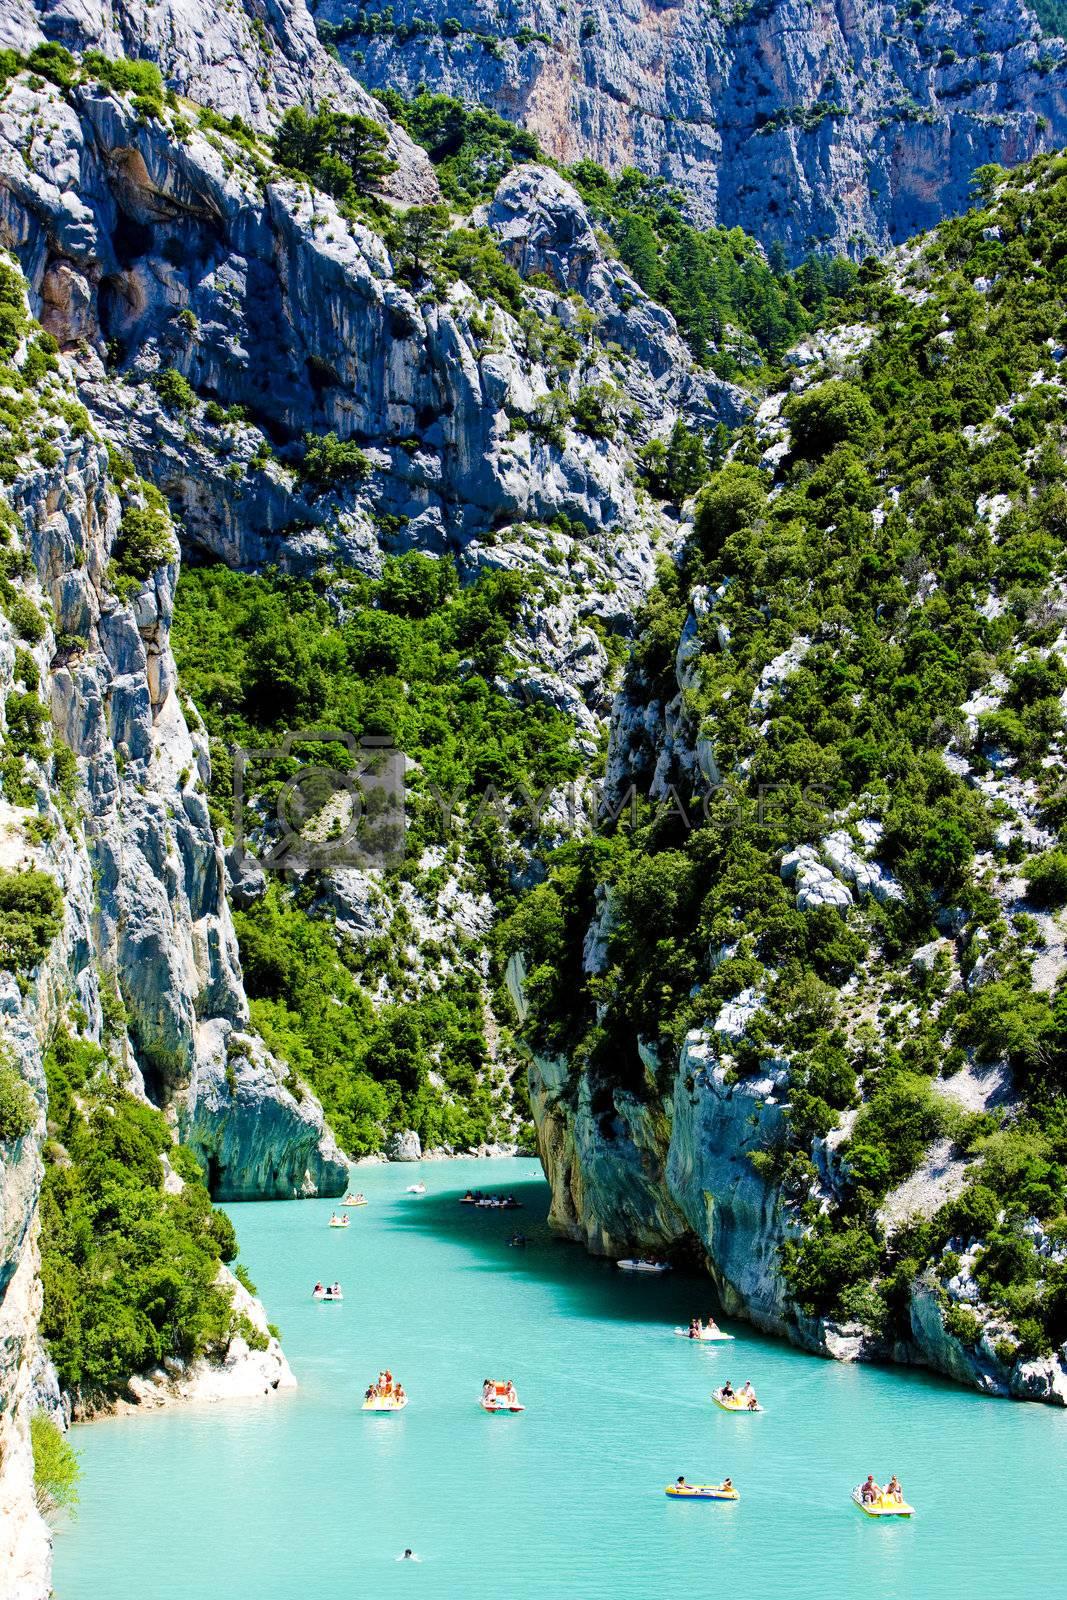 Royalty free image of St Croix Lake, Les Gorges du Verdon, Provence, France by phbcz